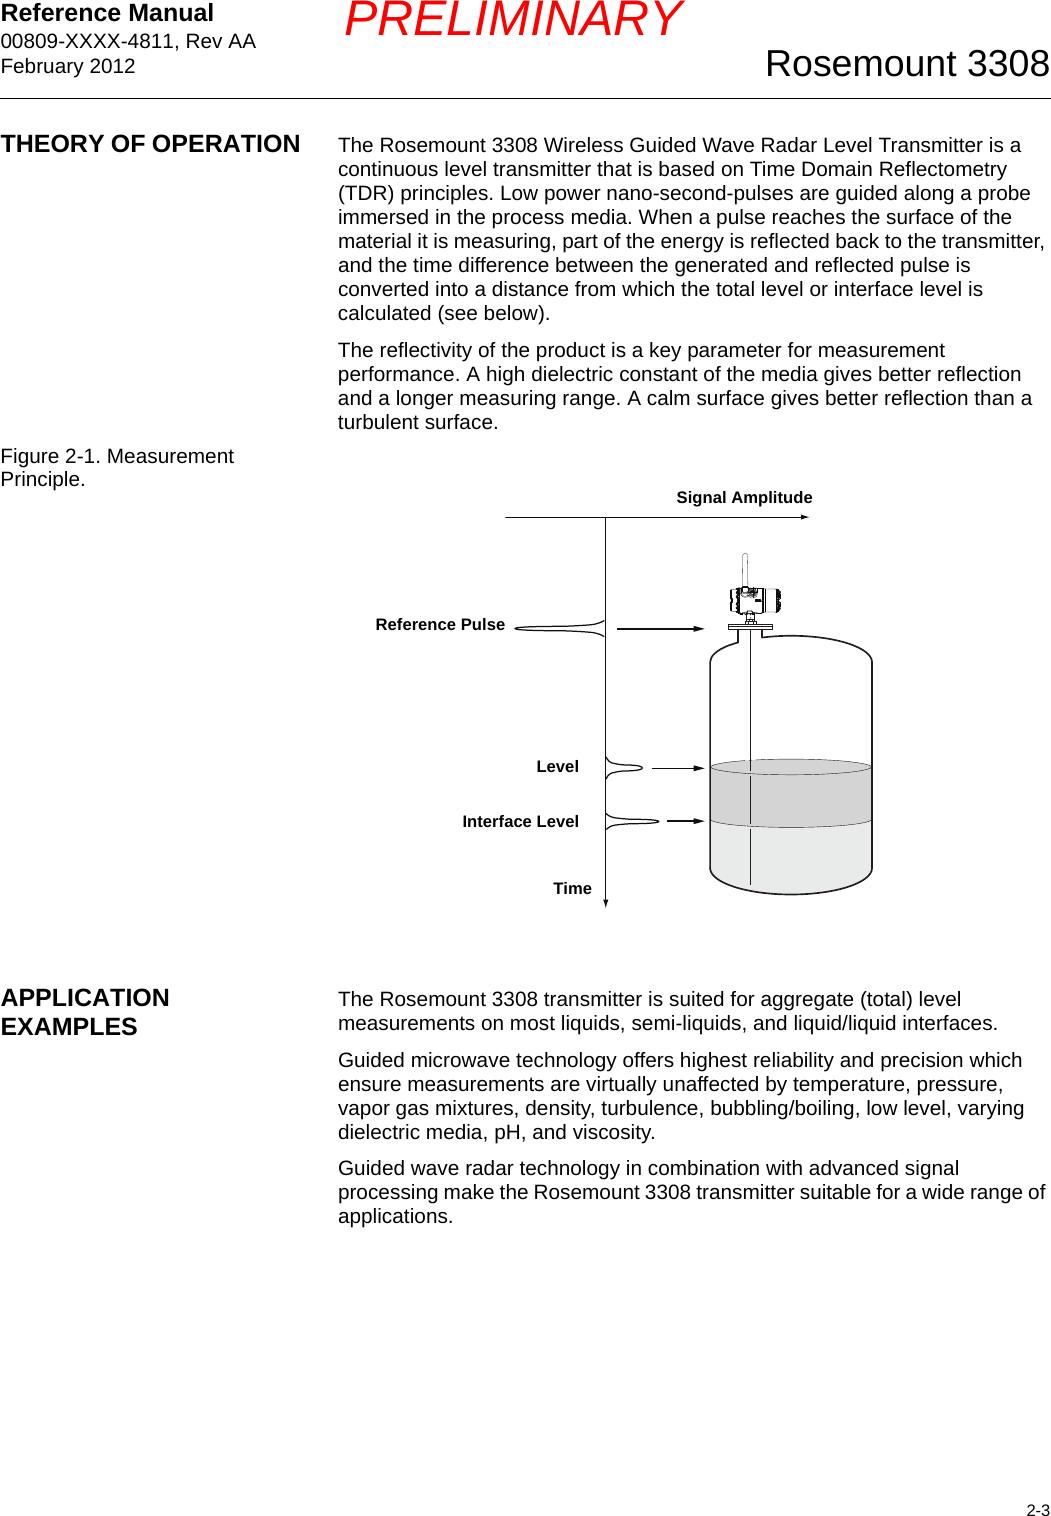 Rosemount 3308a Wireless Guided Wave Radar Level U0026 Interfa Manual Guide